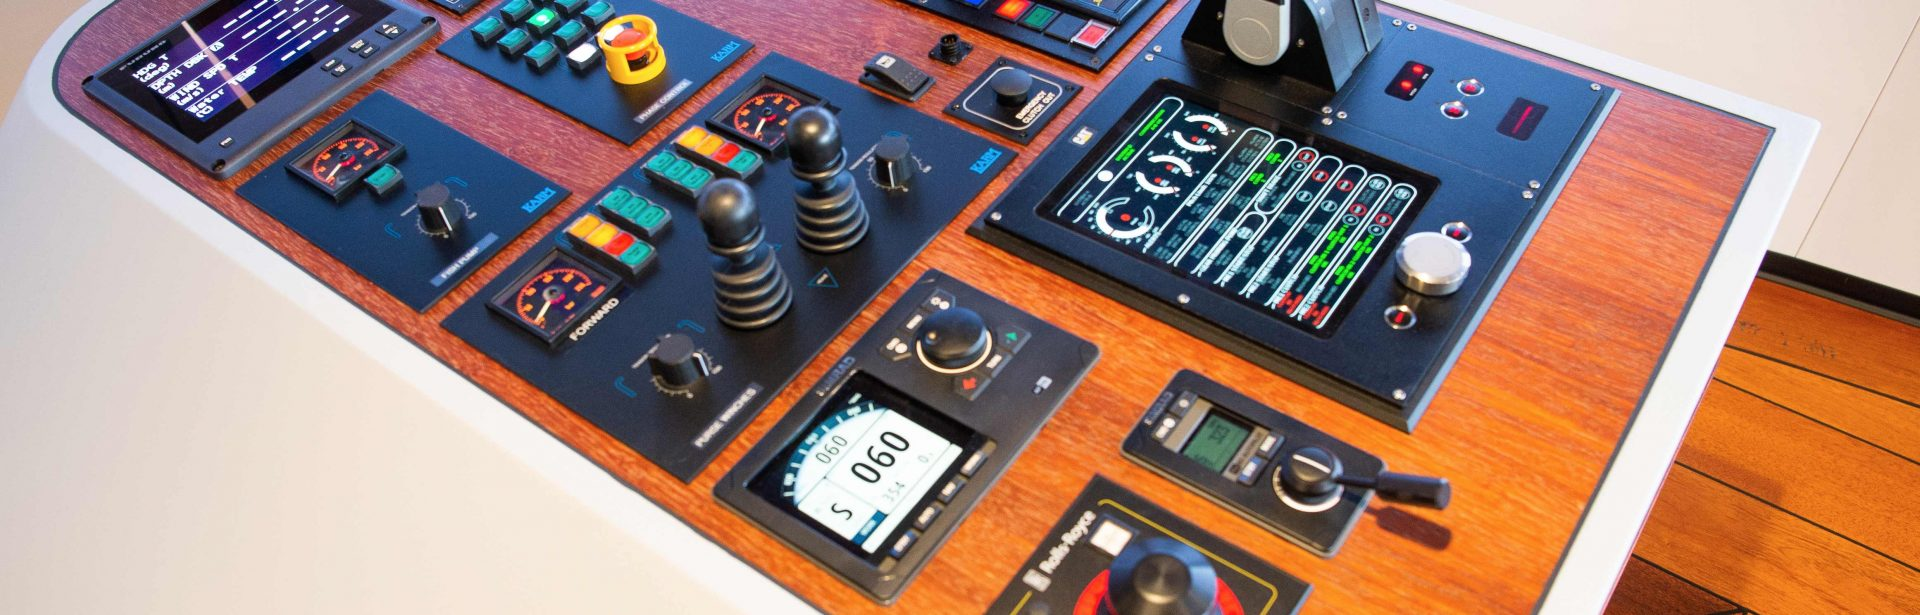 Elpro-Maritime-Consoles